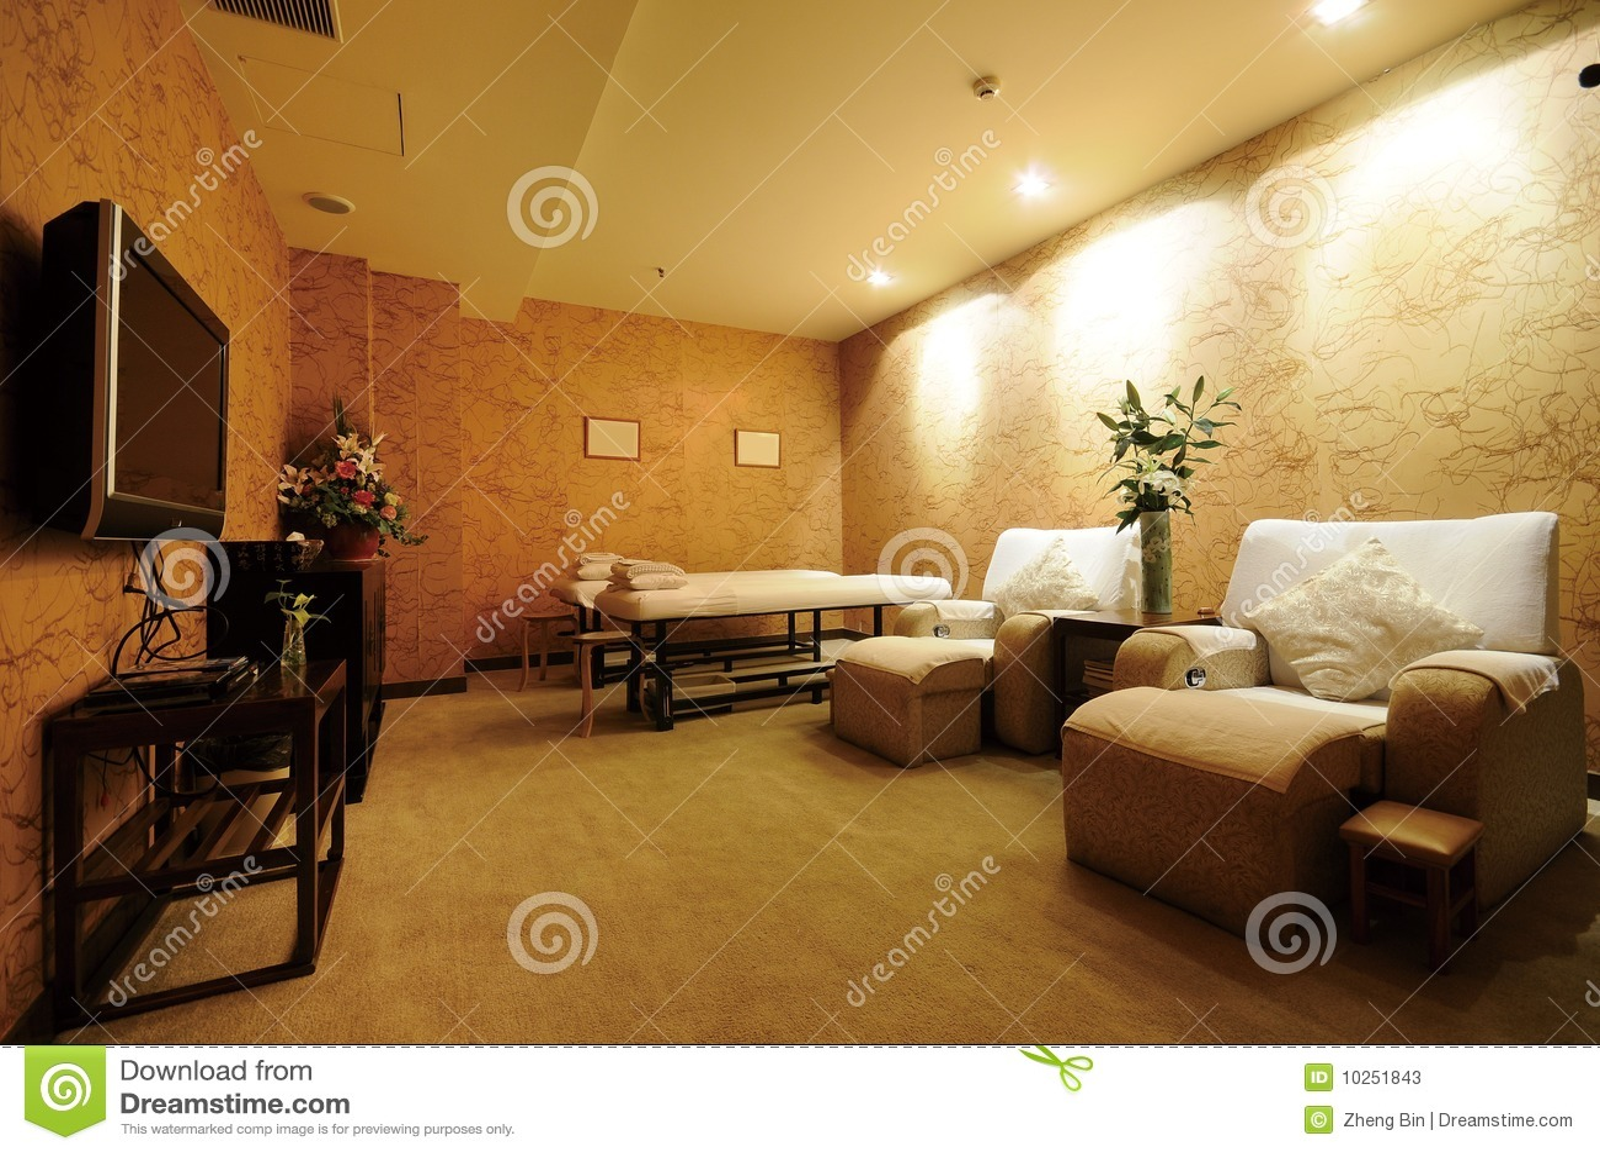 Massage Rooms Free